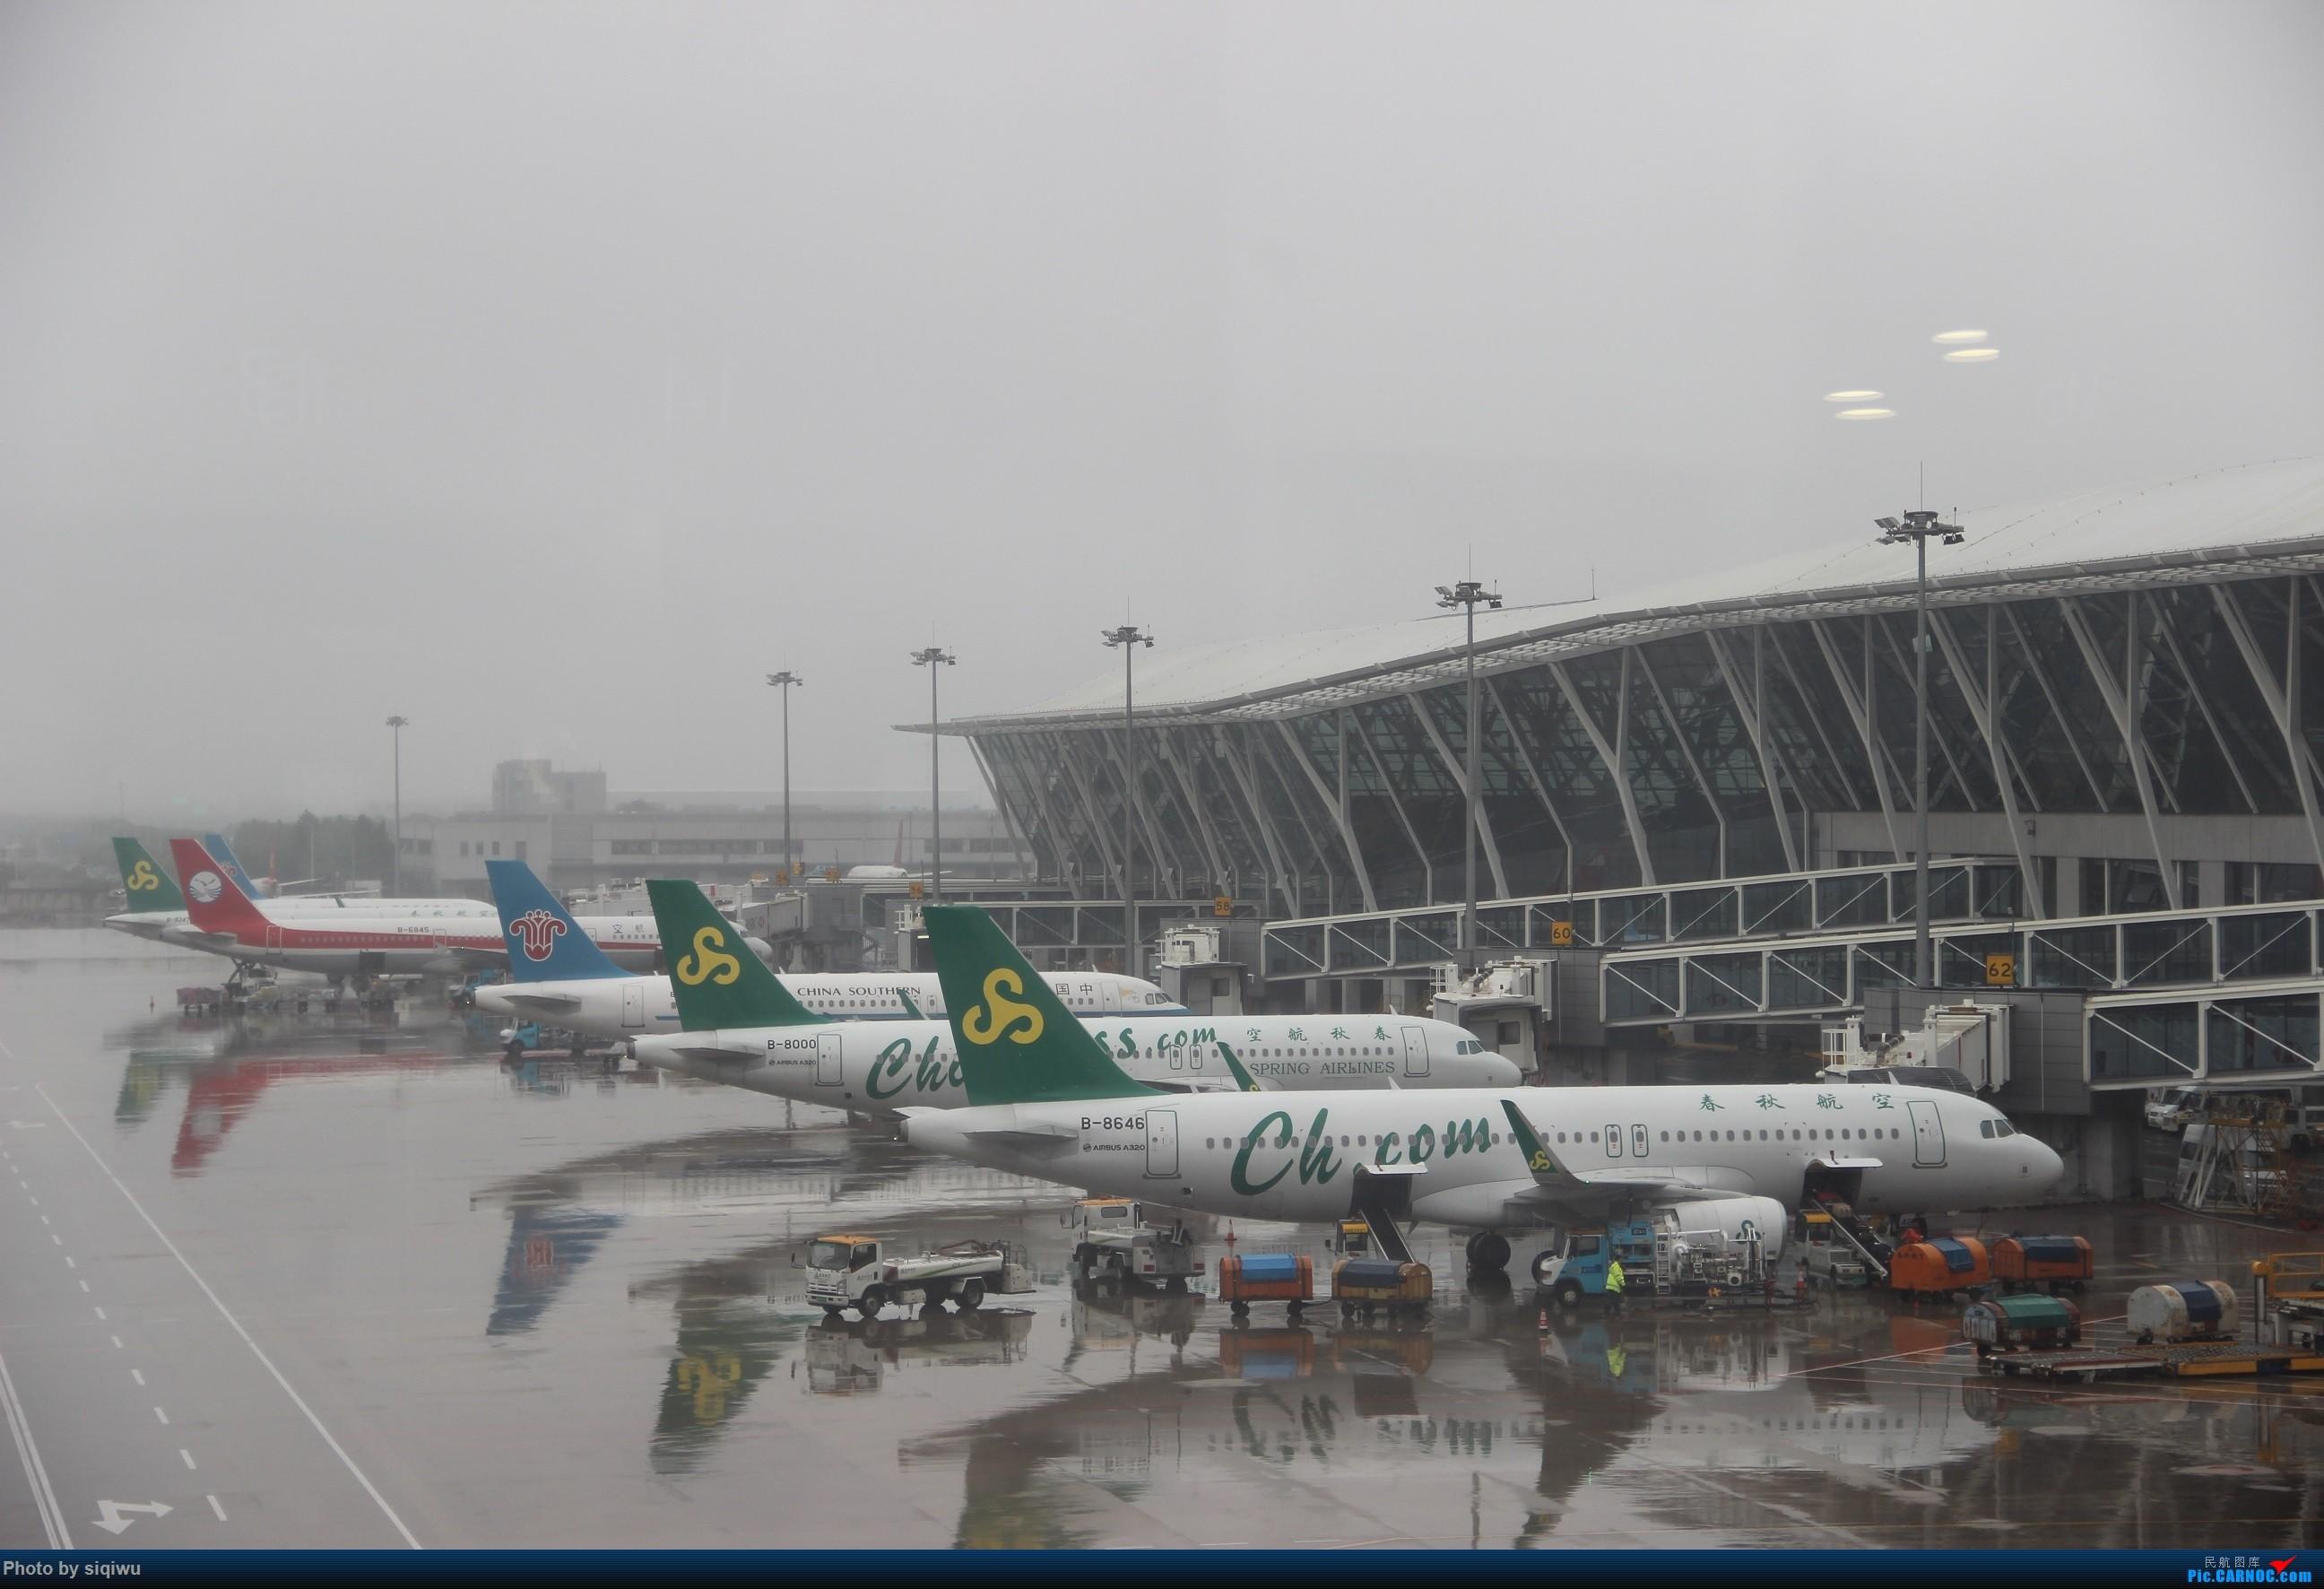 Re:[原创]PVG-HKG-KUL-HKG-PVG 四天往返,CX/KA    中国上海浦东国际机场